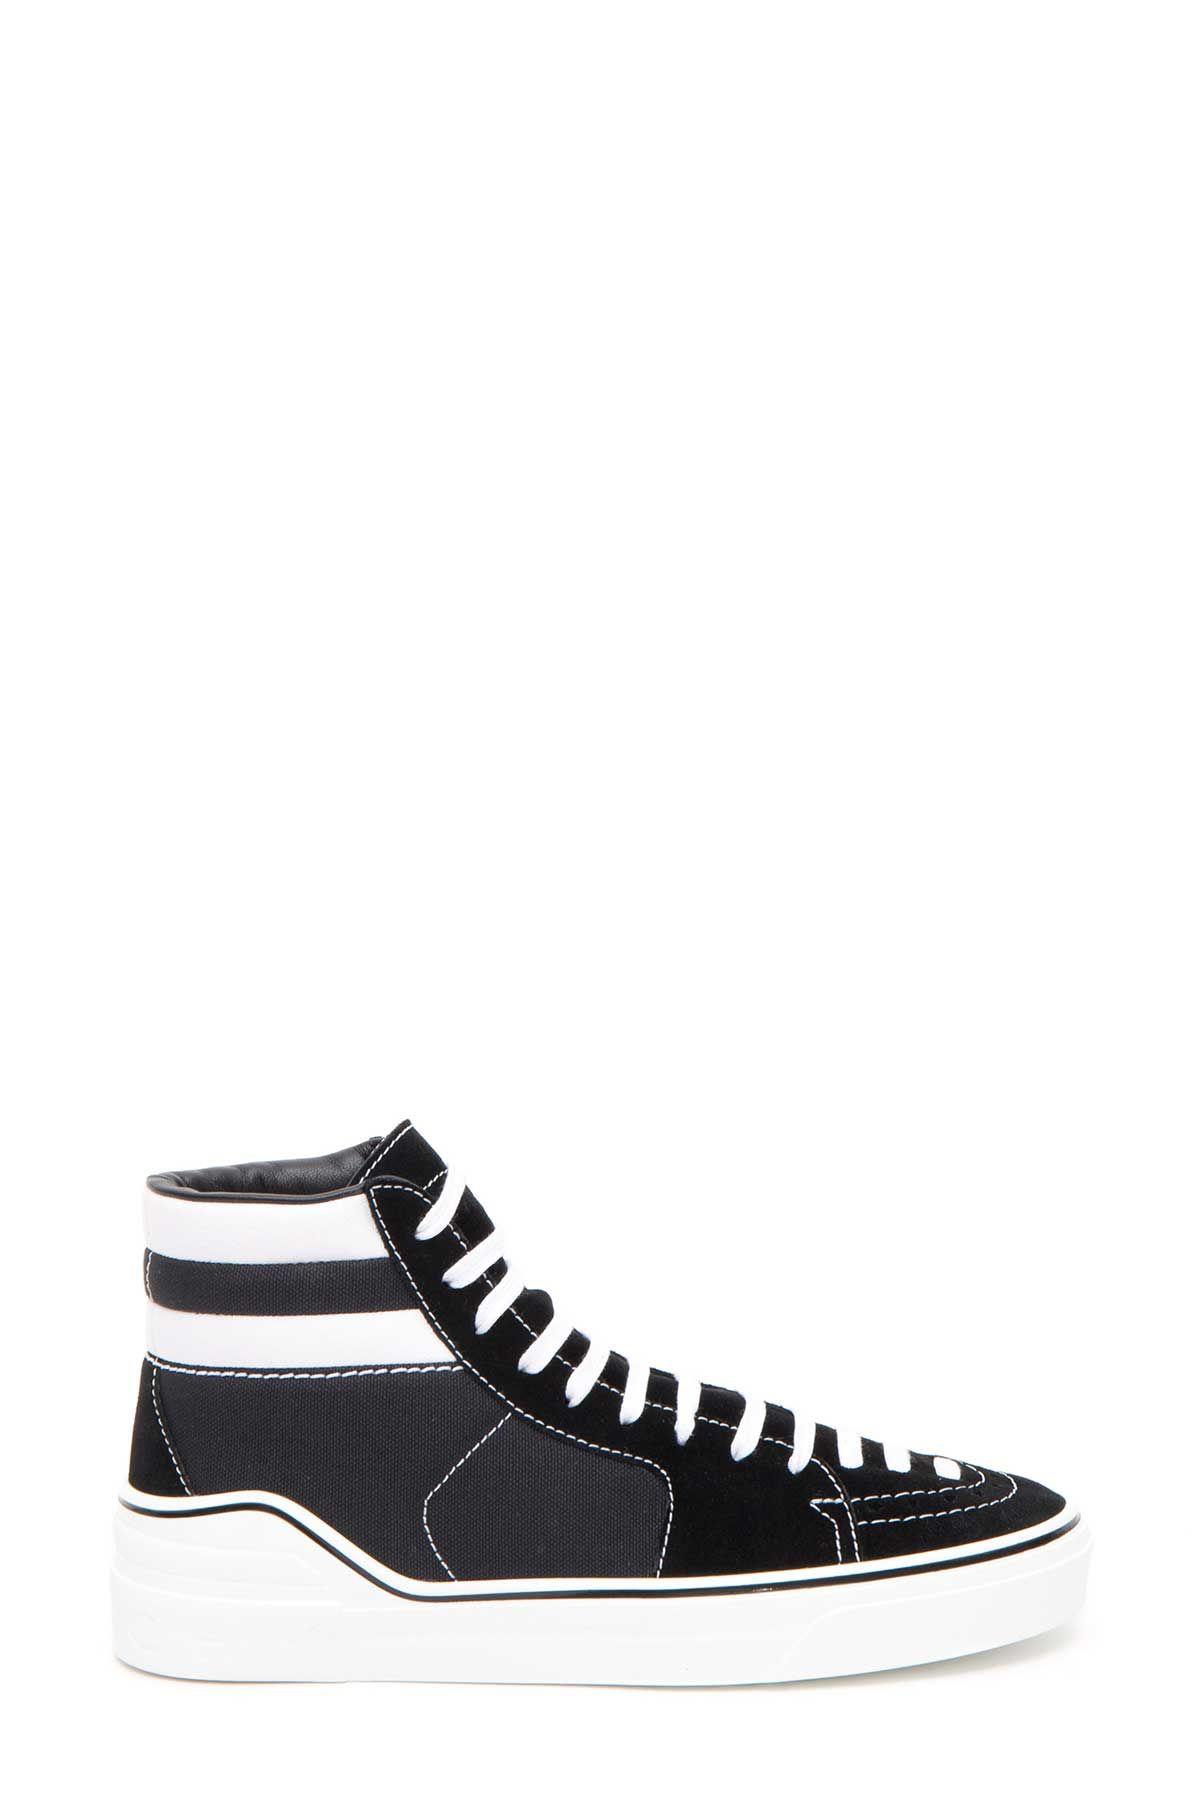 Chevron Oxford Shoes Review